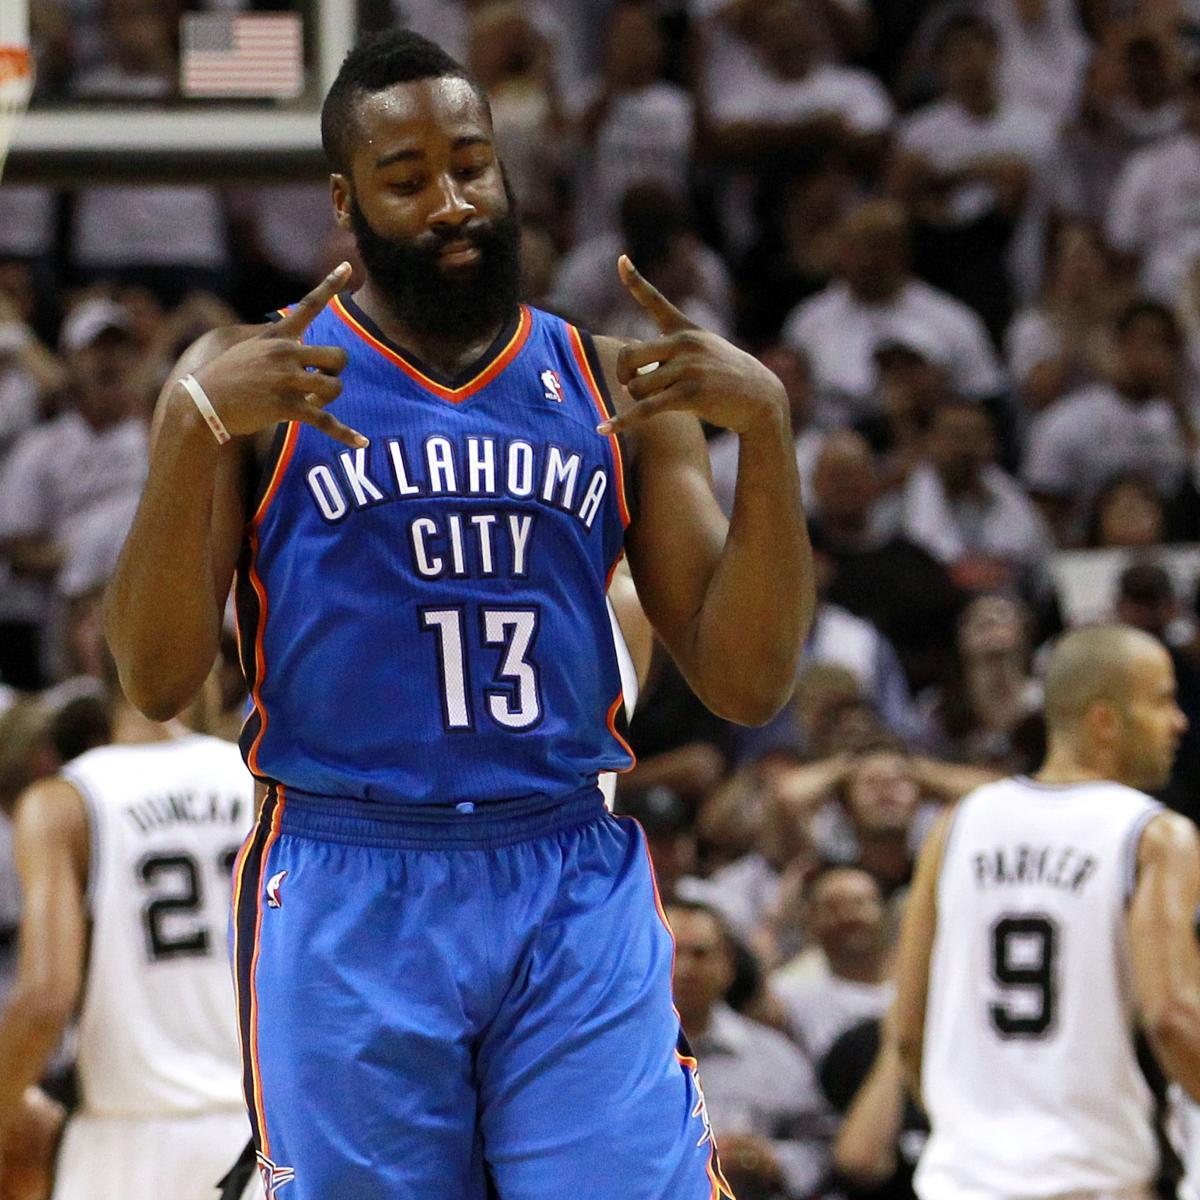 James Harden In Okc: James Harden, Oklahoma City Thunder Make Yet Another